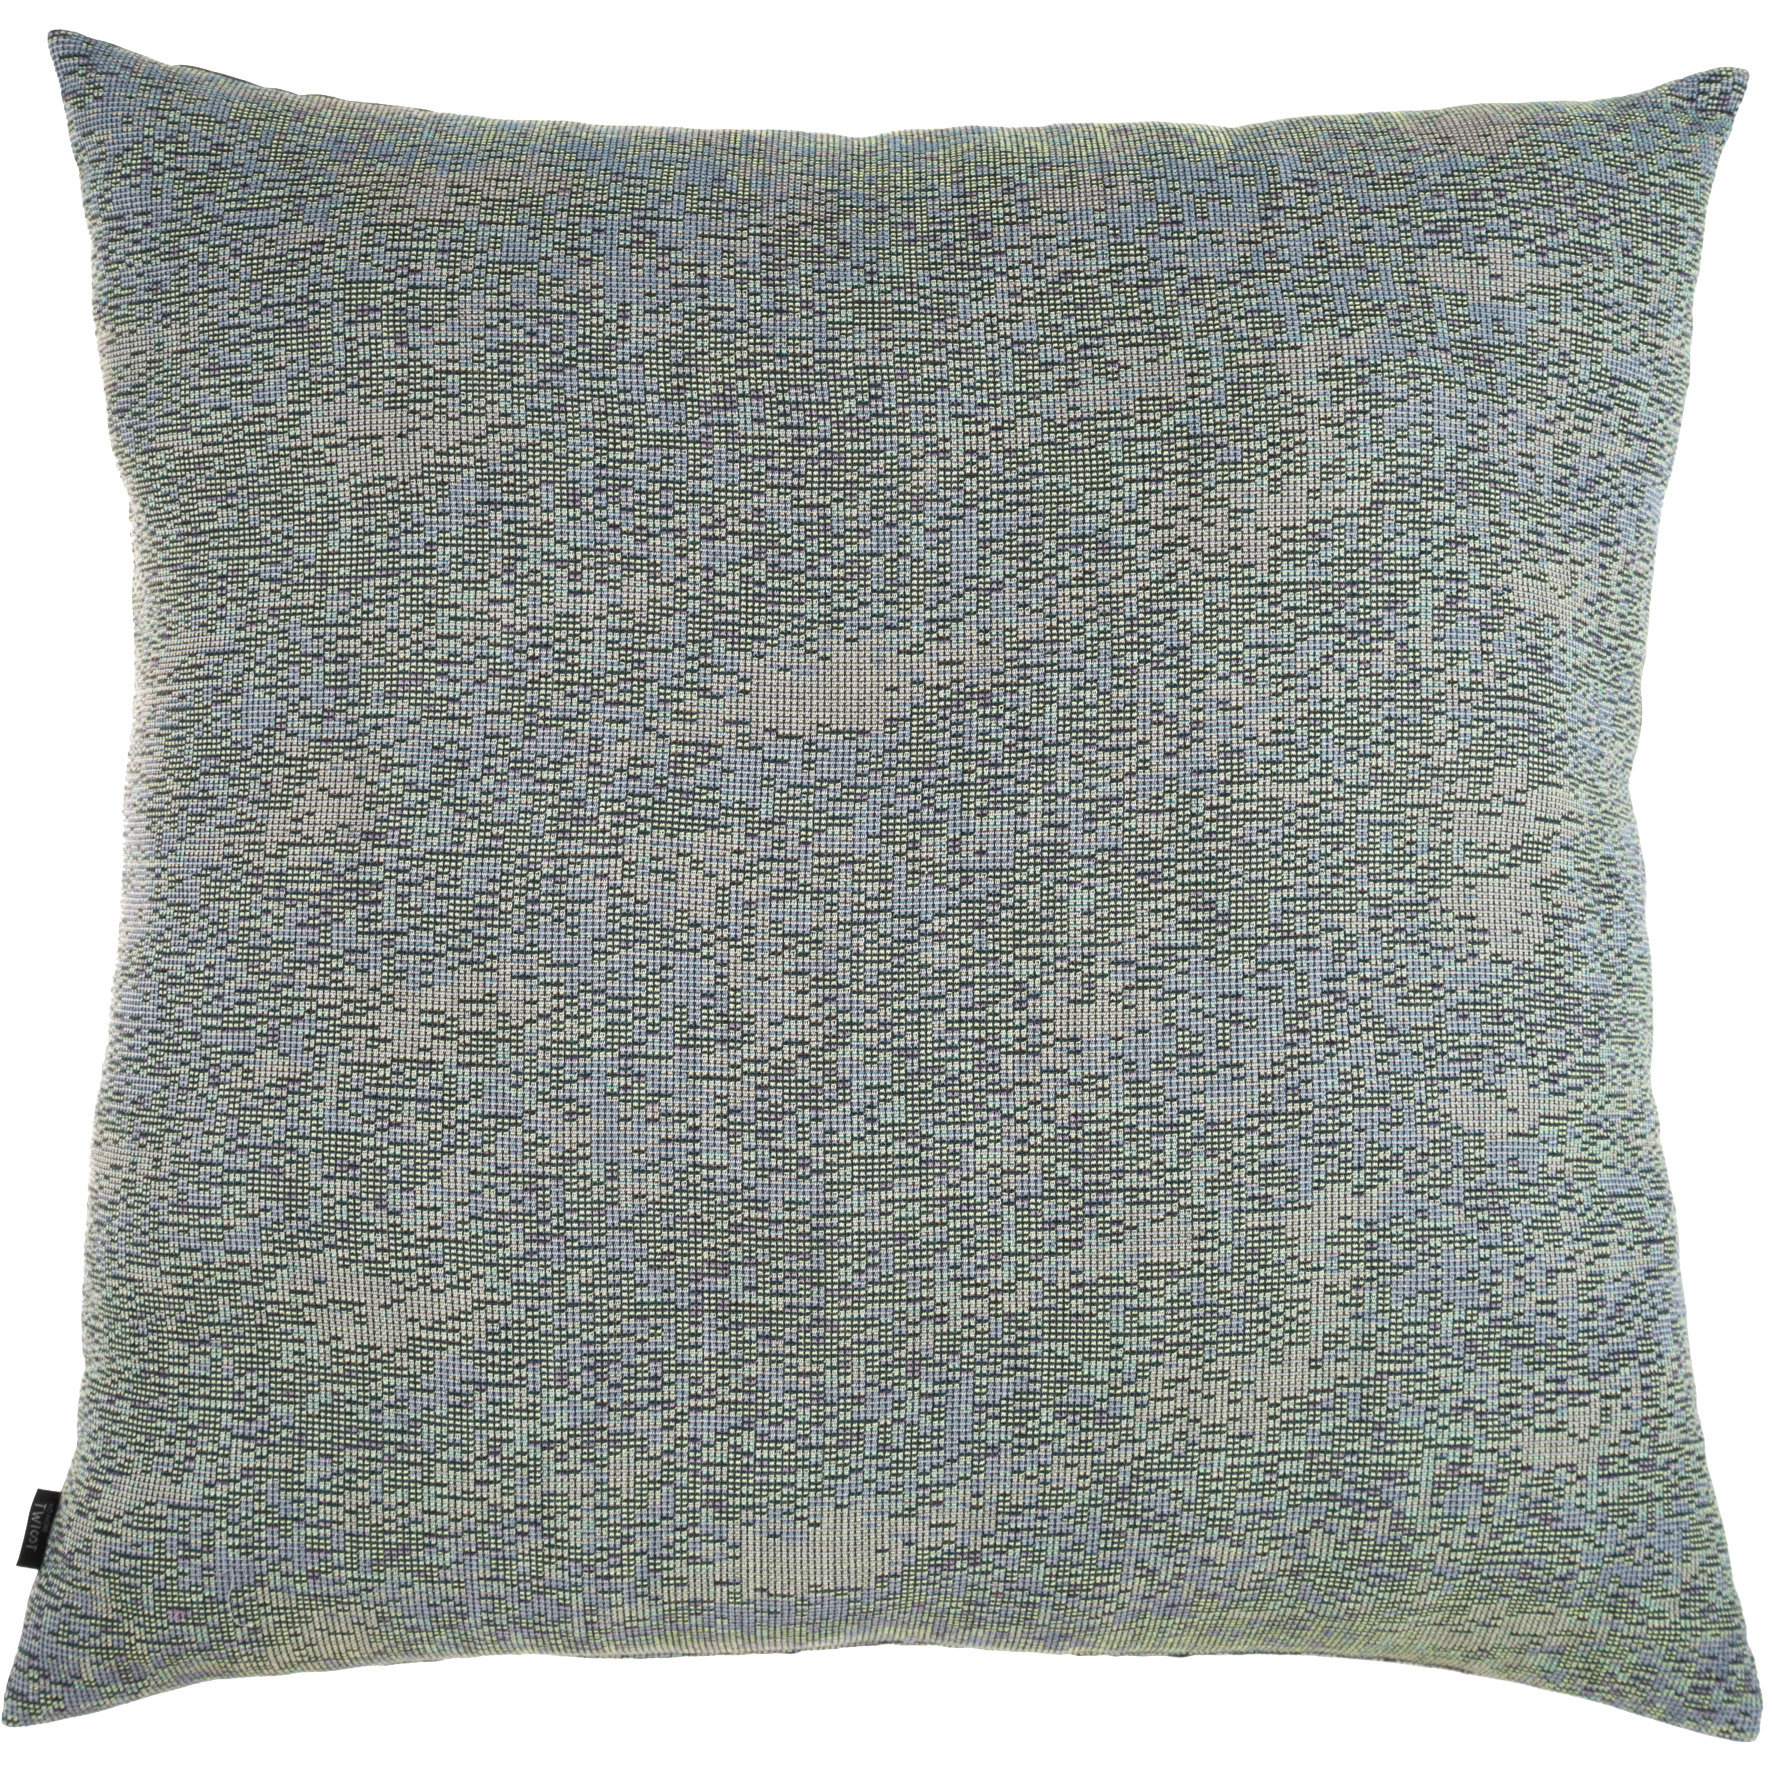 Reflet/ dark blue - floor cushion XL ≅ 90 x 90 cm  Composition frontside: jacquard woven fabric 78% wool 16% viscose 6% silk Composition backside: plain weave grey fabric, 80% cotton, 20% polyester